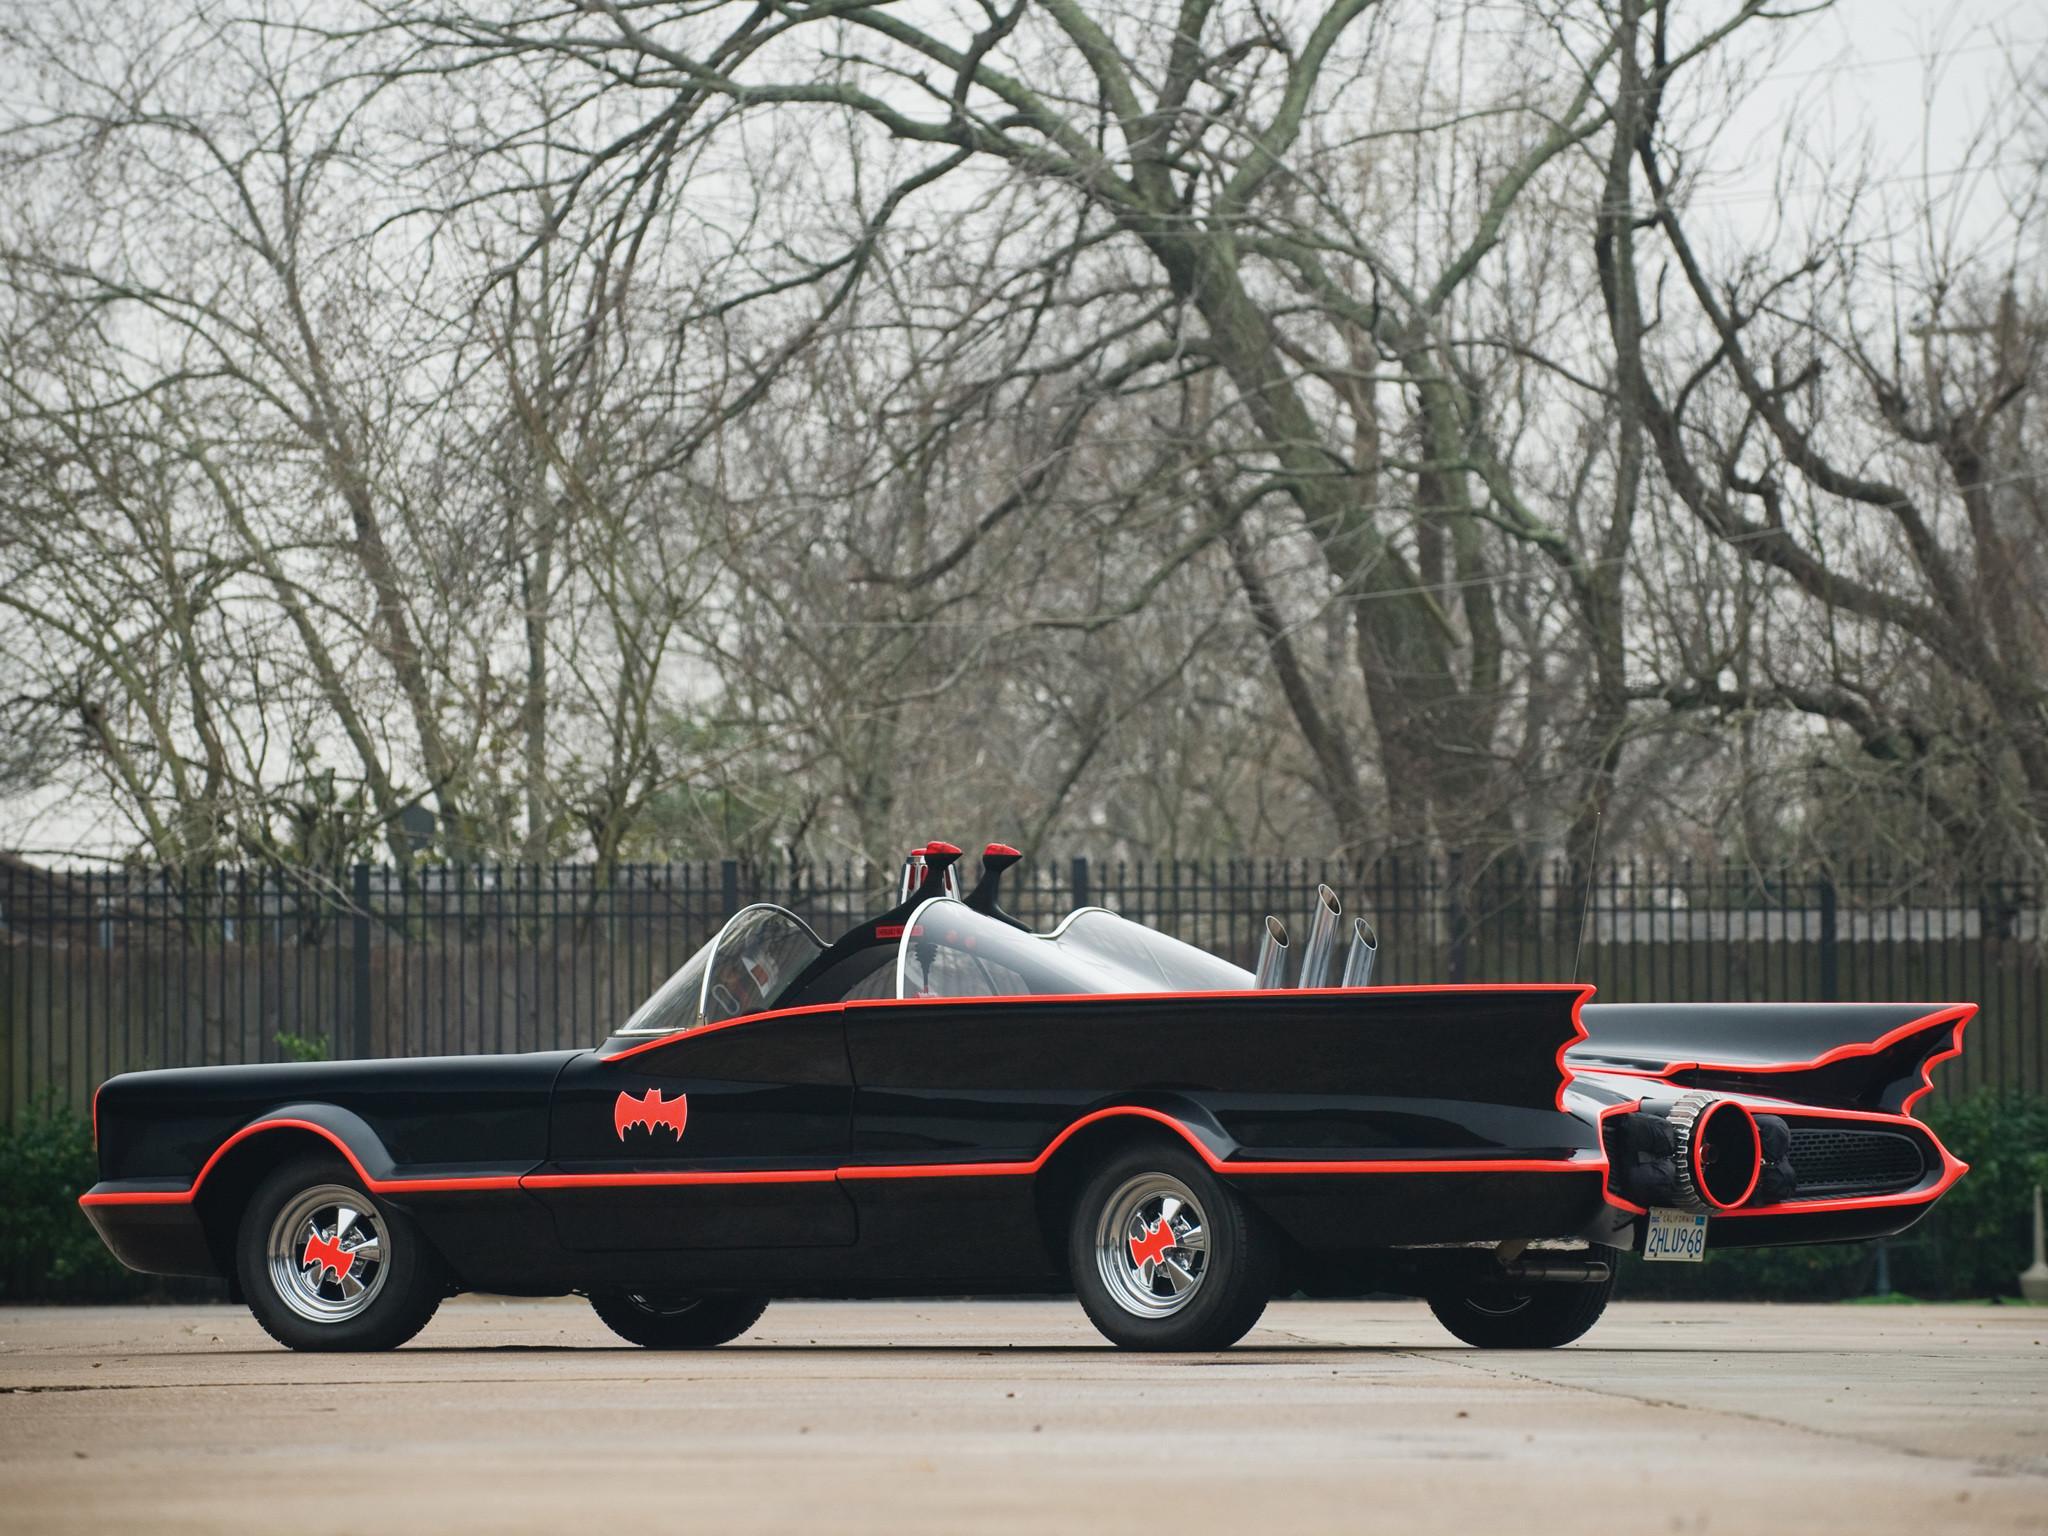 1966 Lincoln Futura Batmobile by Barris Kustom custum superhero batman dark  knight supercar concept gd wallpaper | | 153986 | WallpaperUP